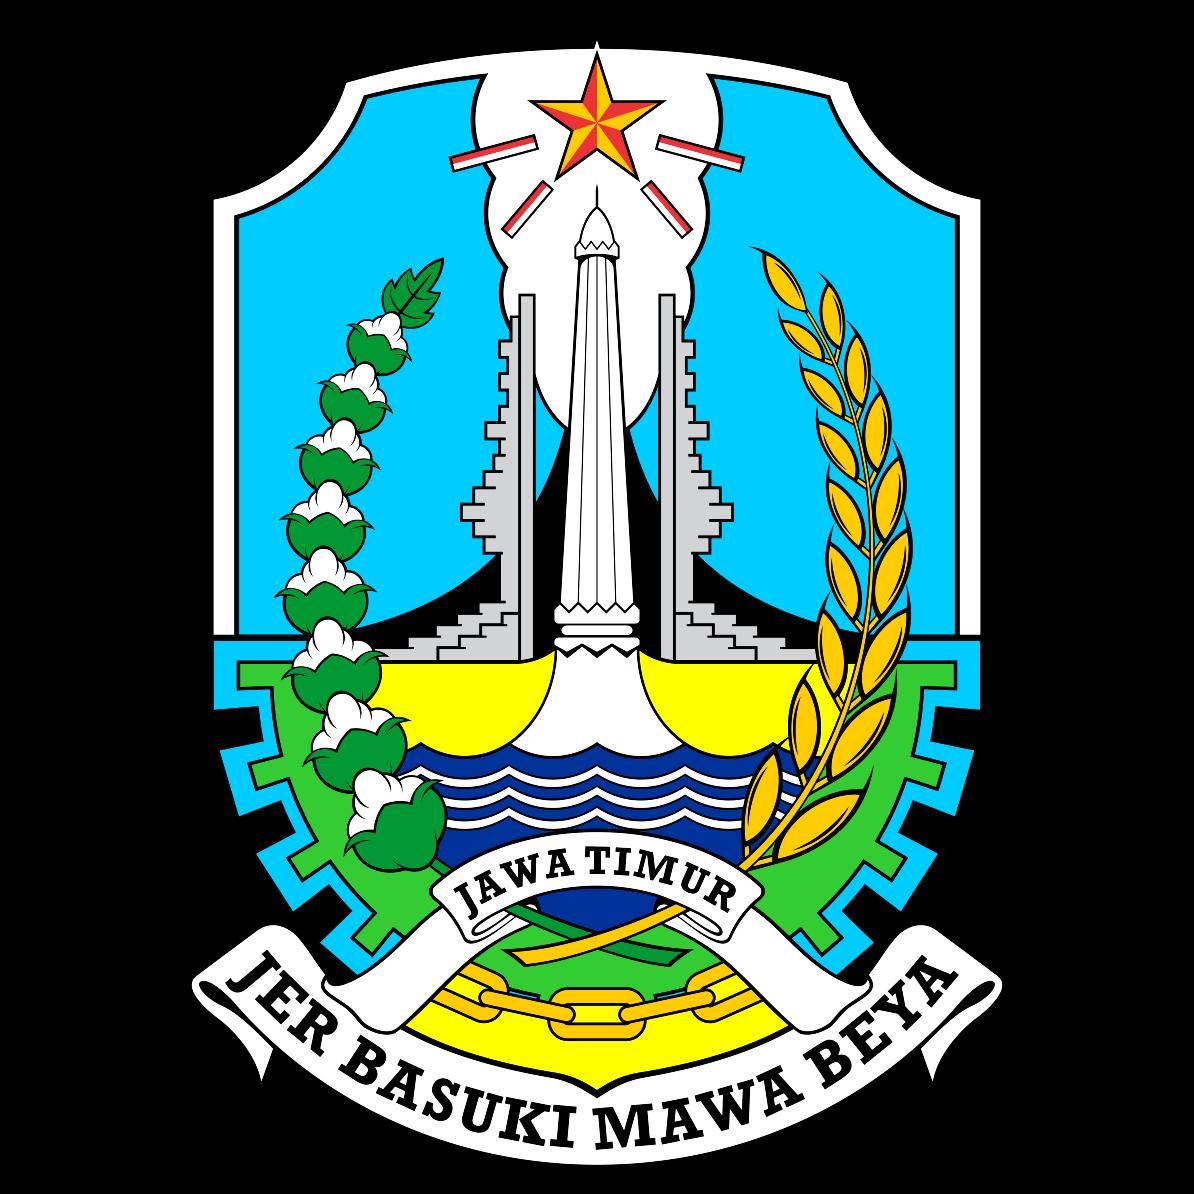 Logo Provinsi Jawa Timur Vektor CDR CorelDraw - Vectorzy ...